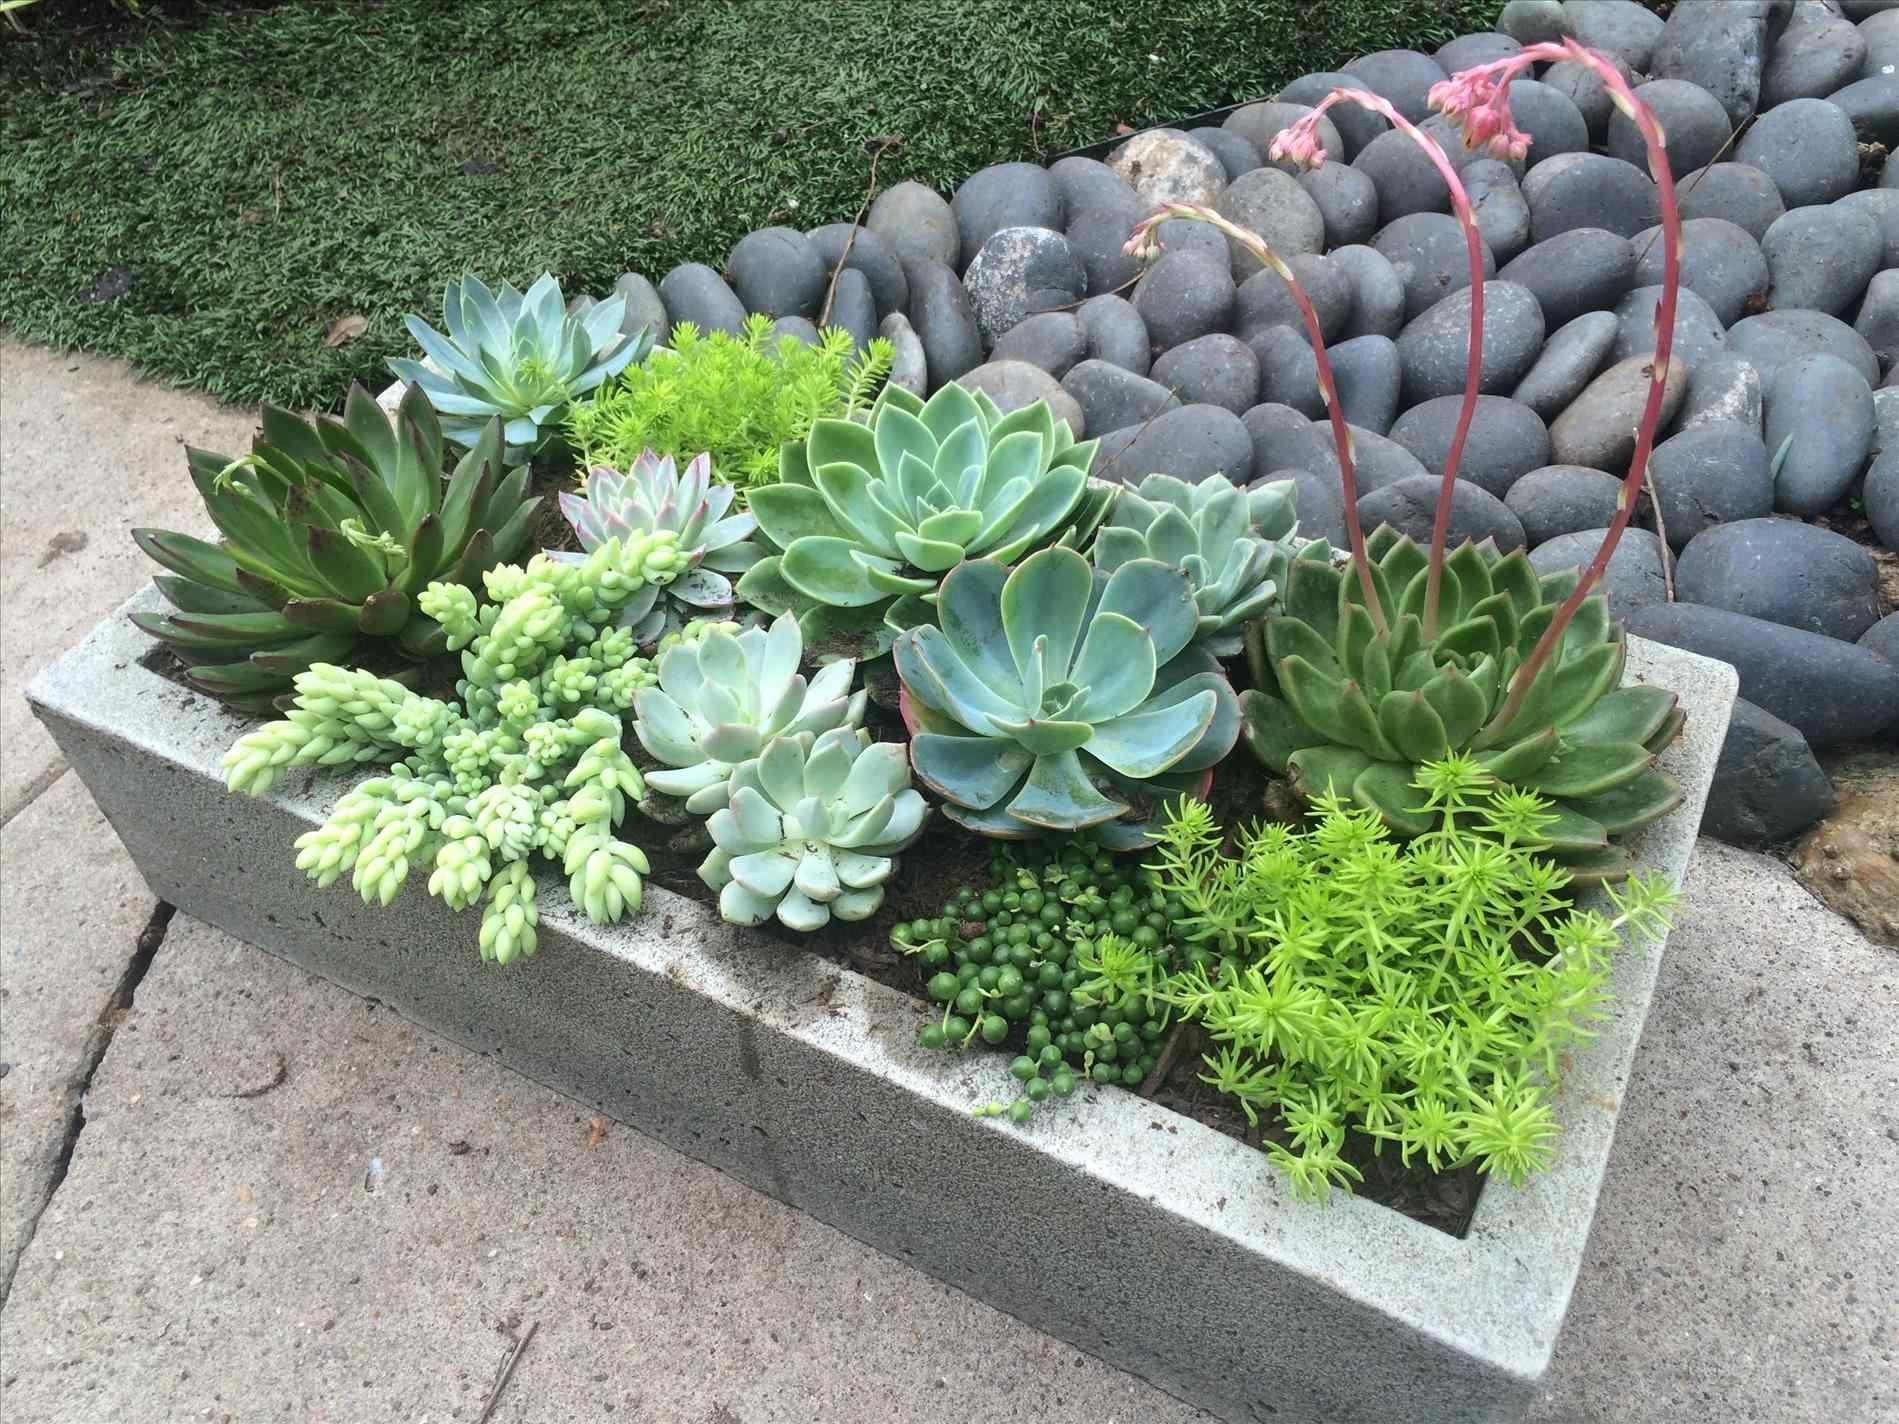 Astounding Top 9 Beautiful Succulent Plants Houston For Indoor Home